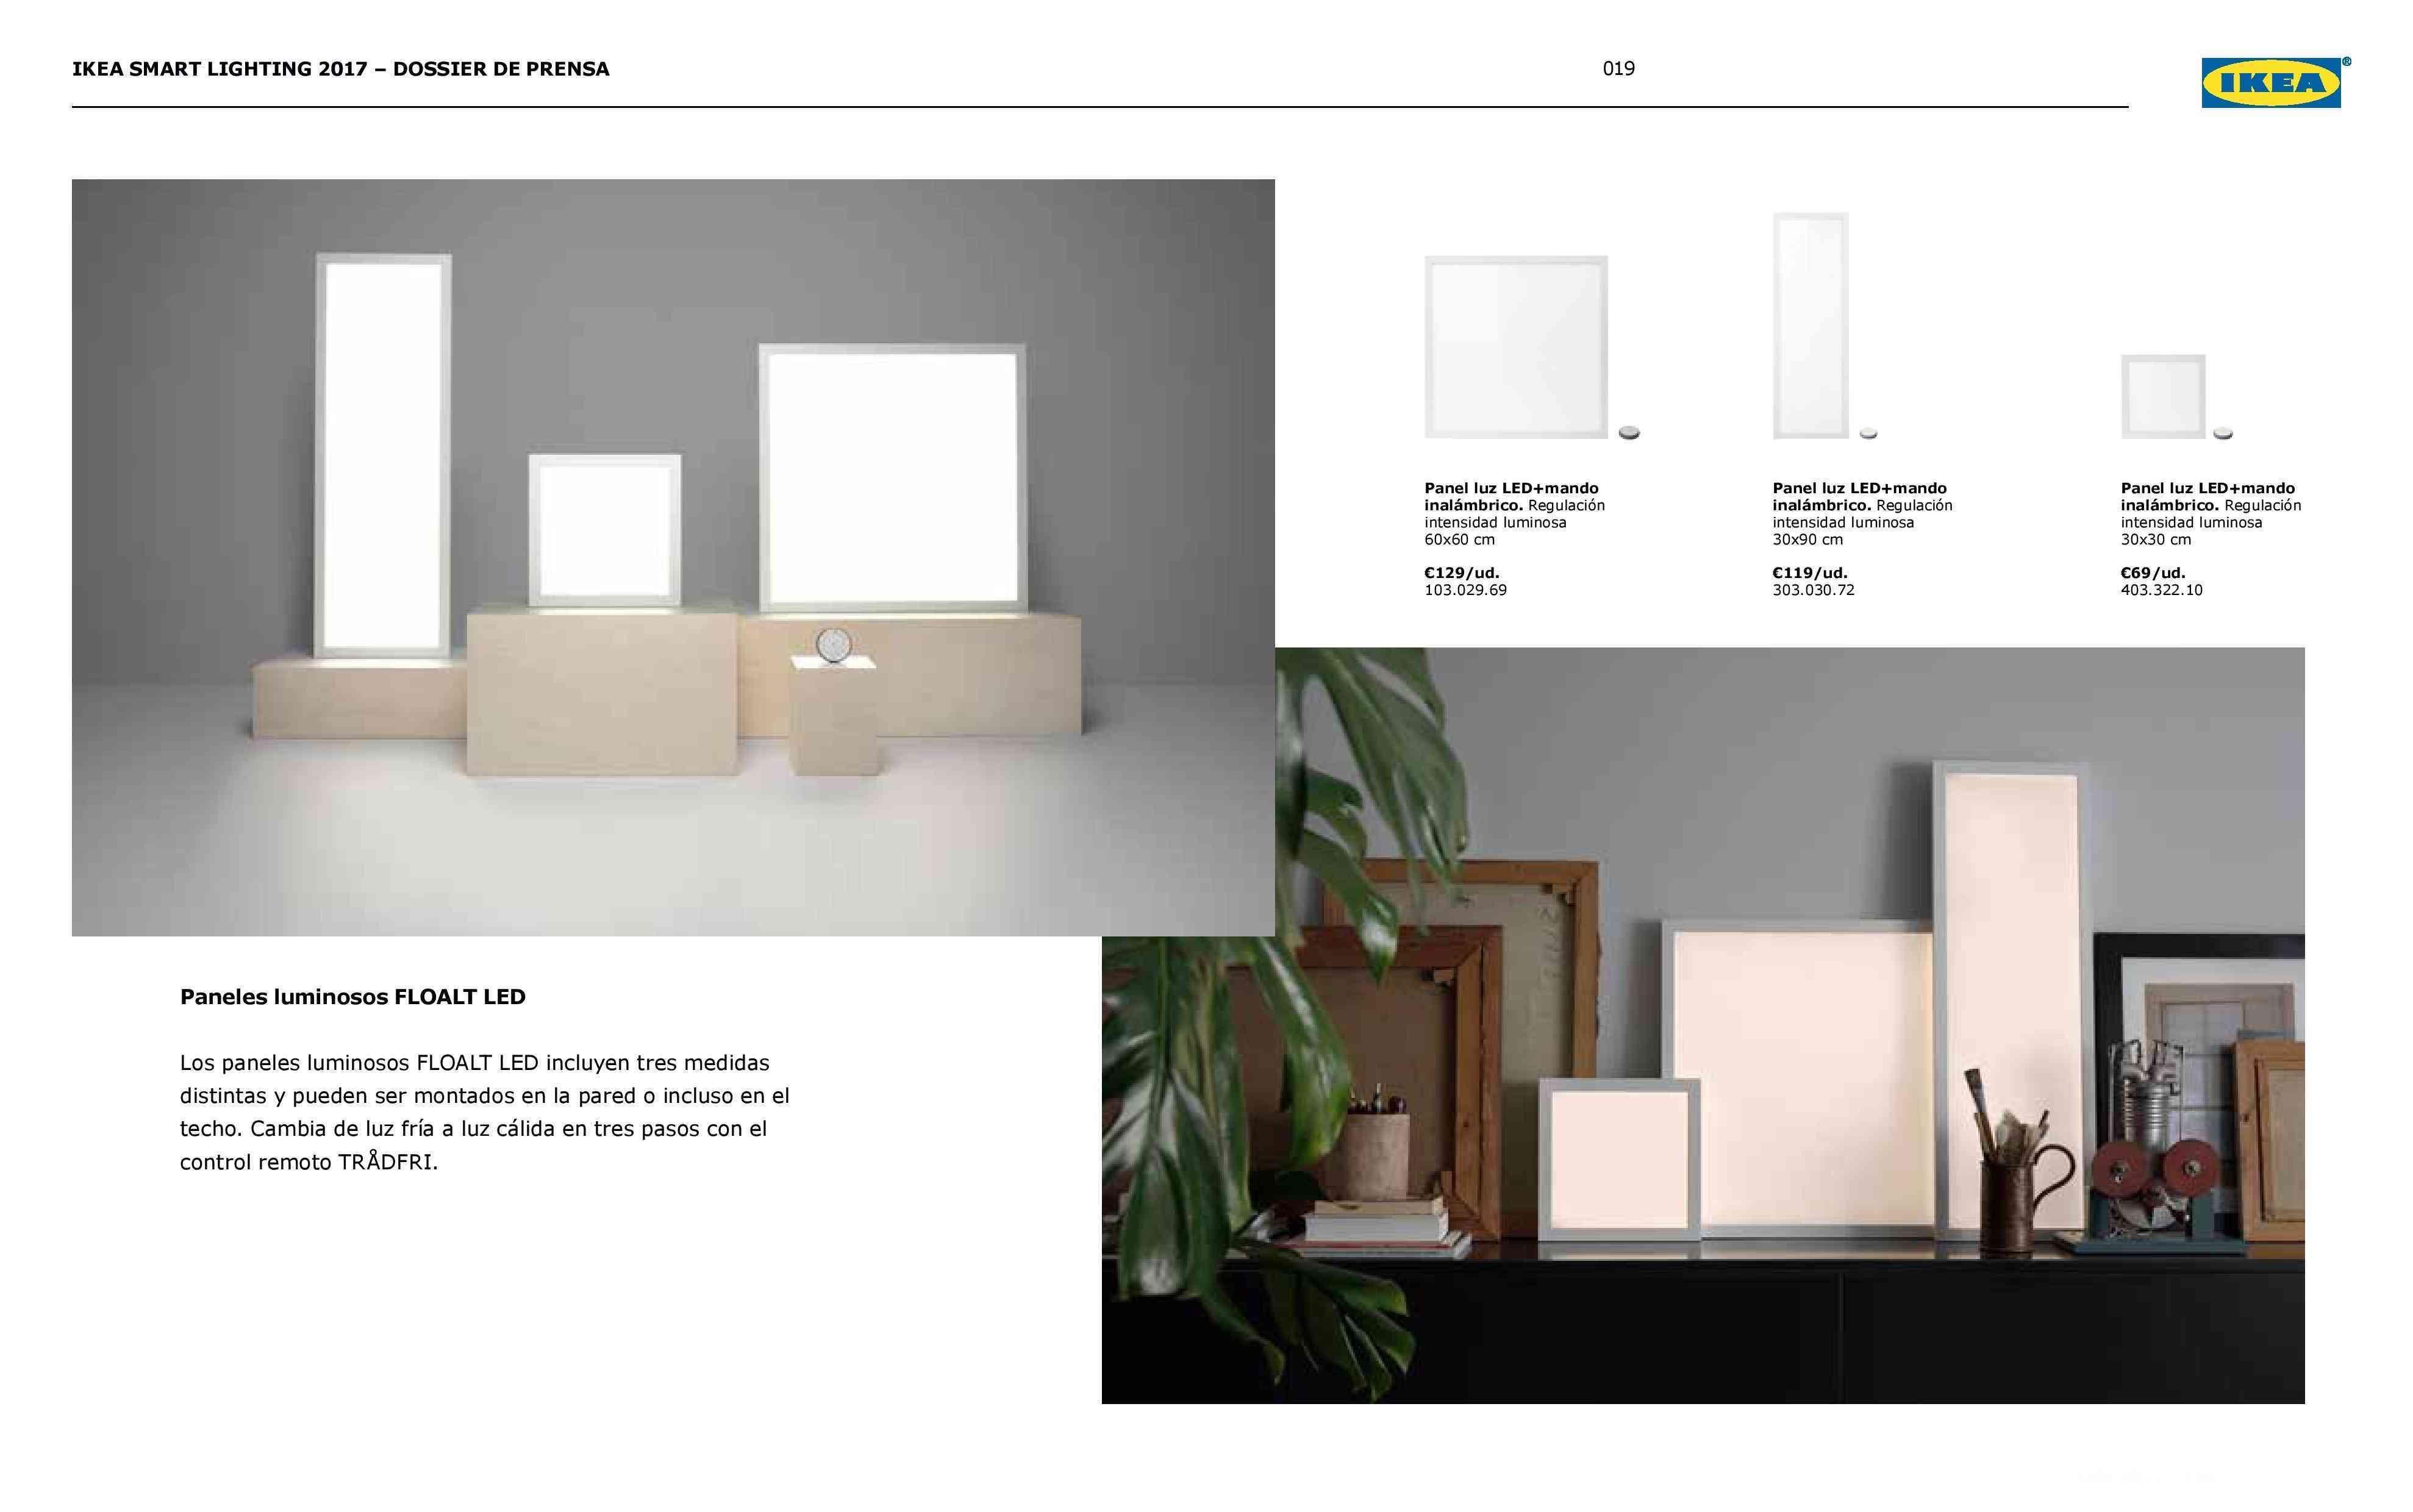 Novedades en iluminación de casas inteligentes con IKEA 75